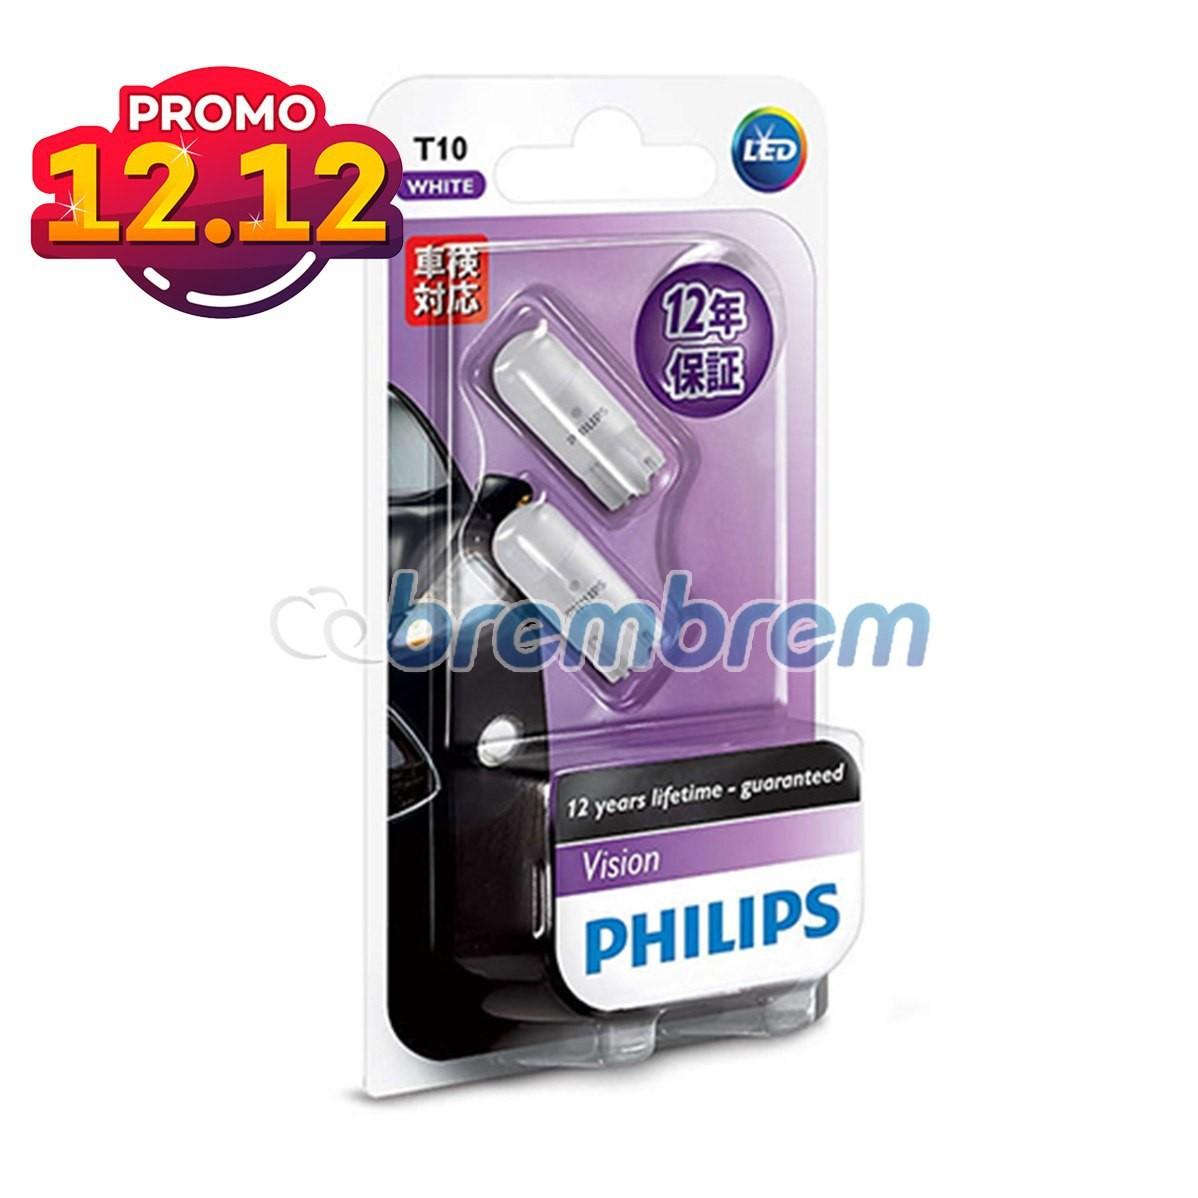 PROMO SERBA 12.12 | PHILIPS VISION T10 (6000K) - LAMPU LED SENJA